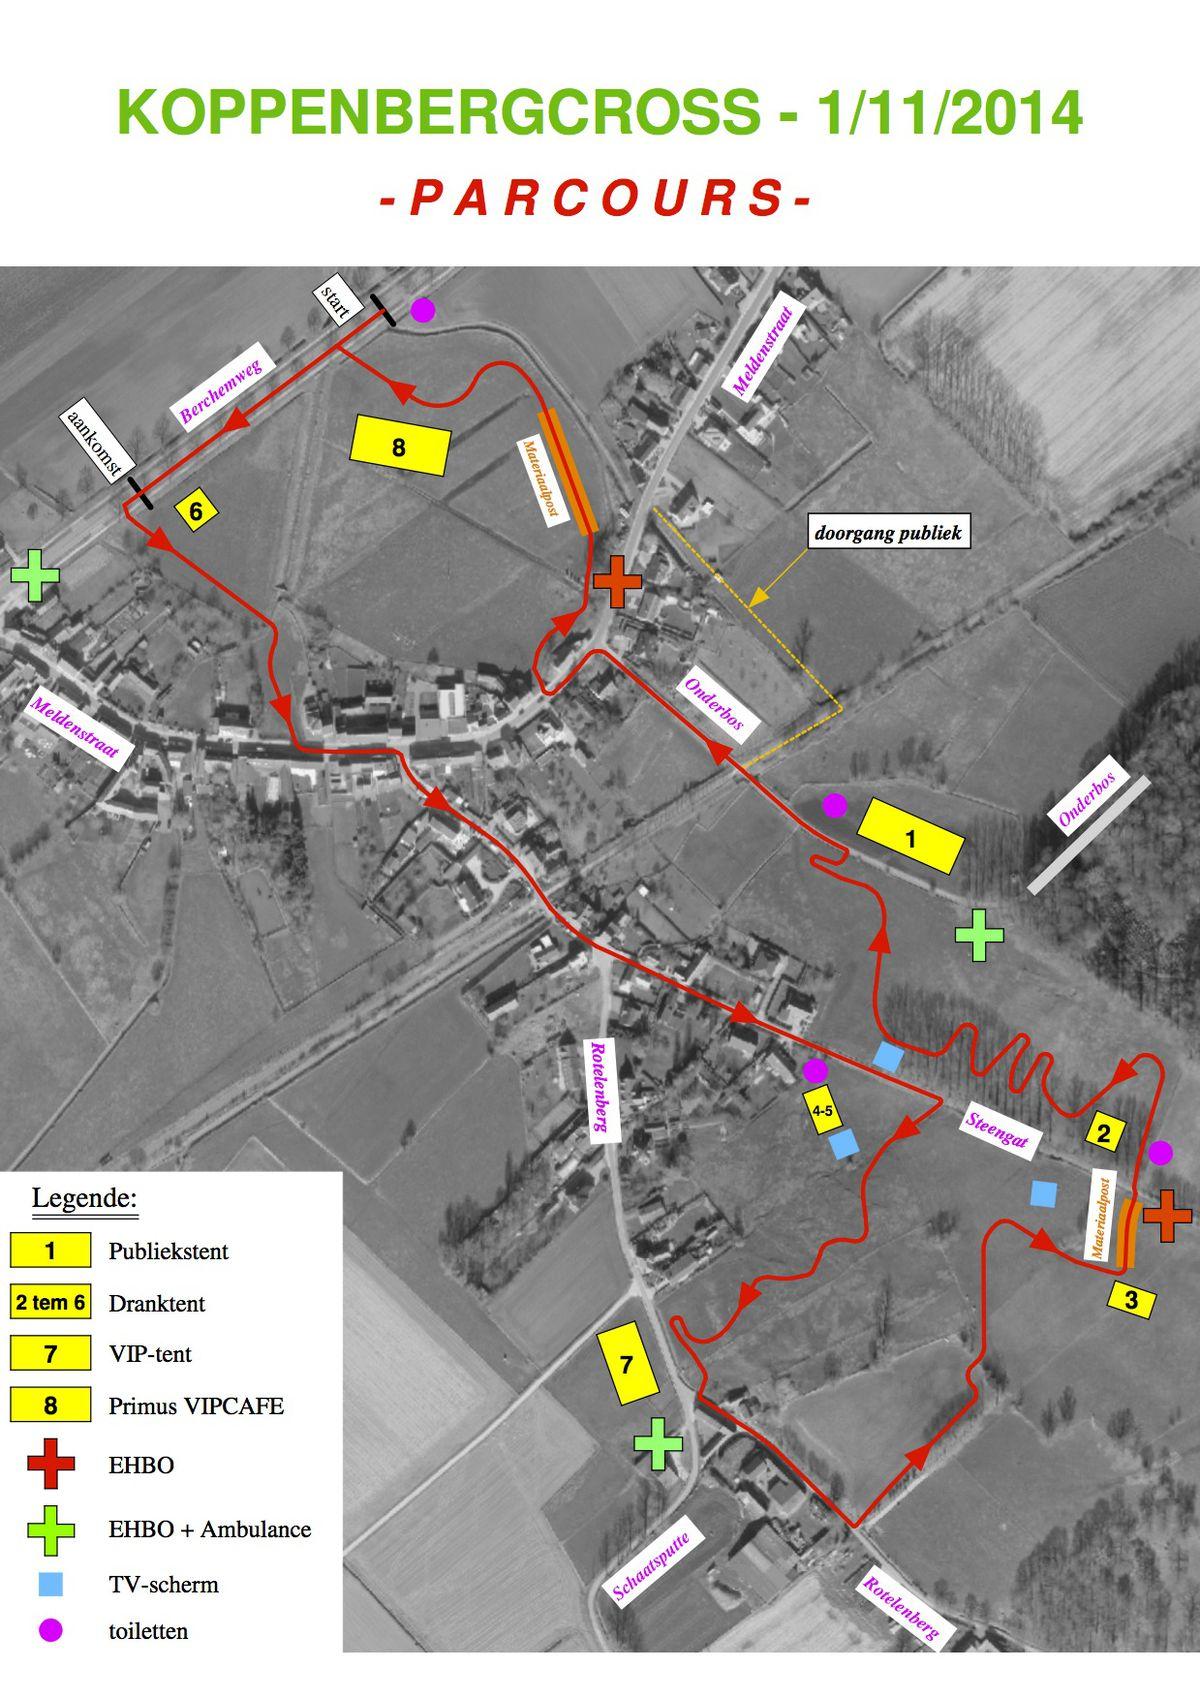 Koppenbergcross parcours